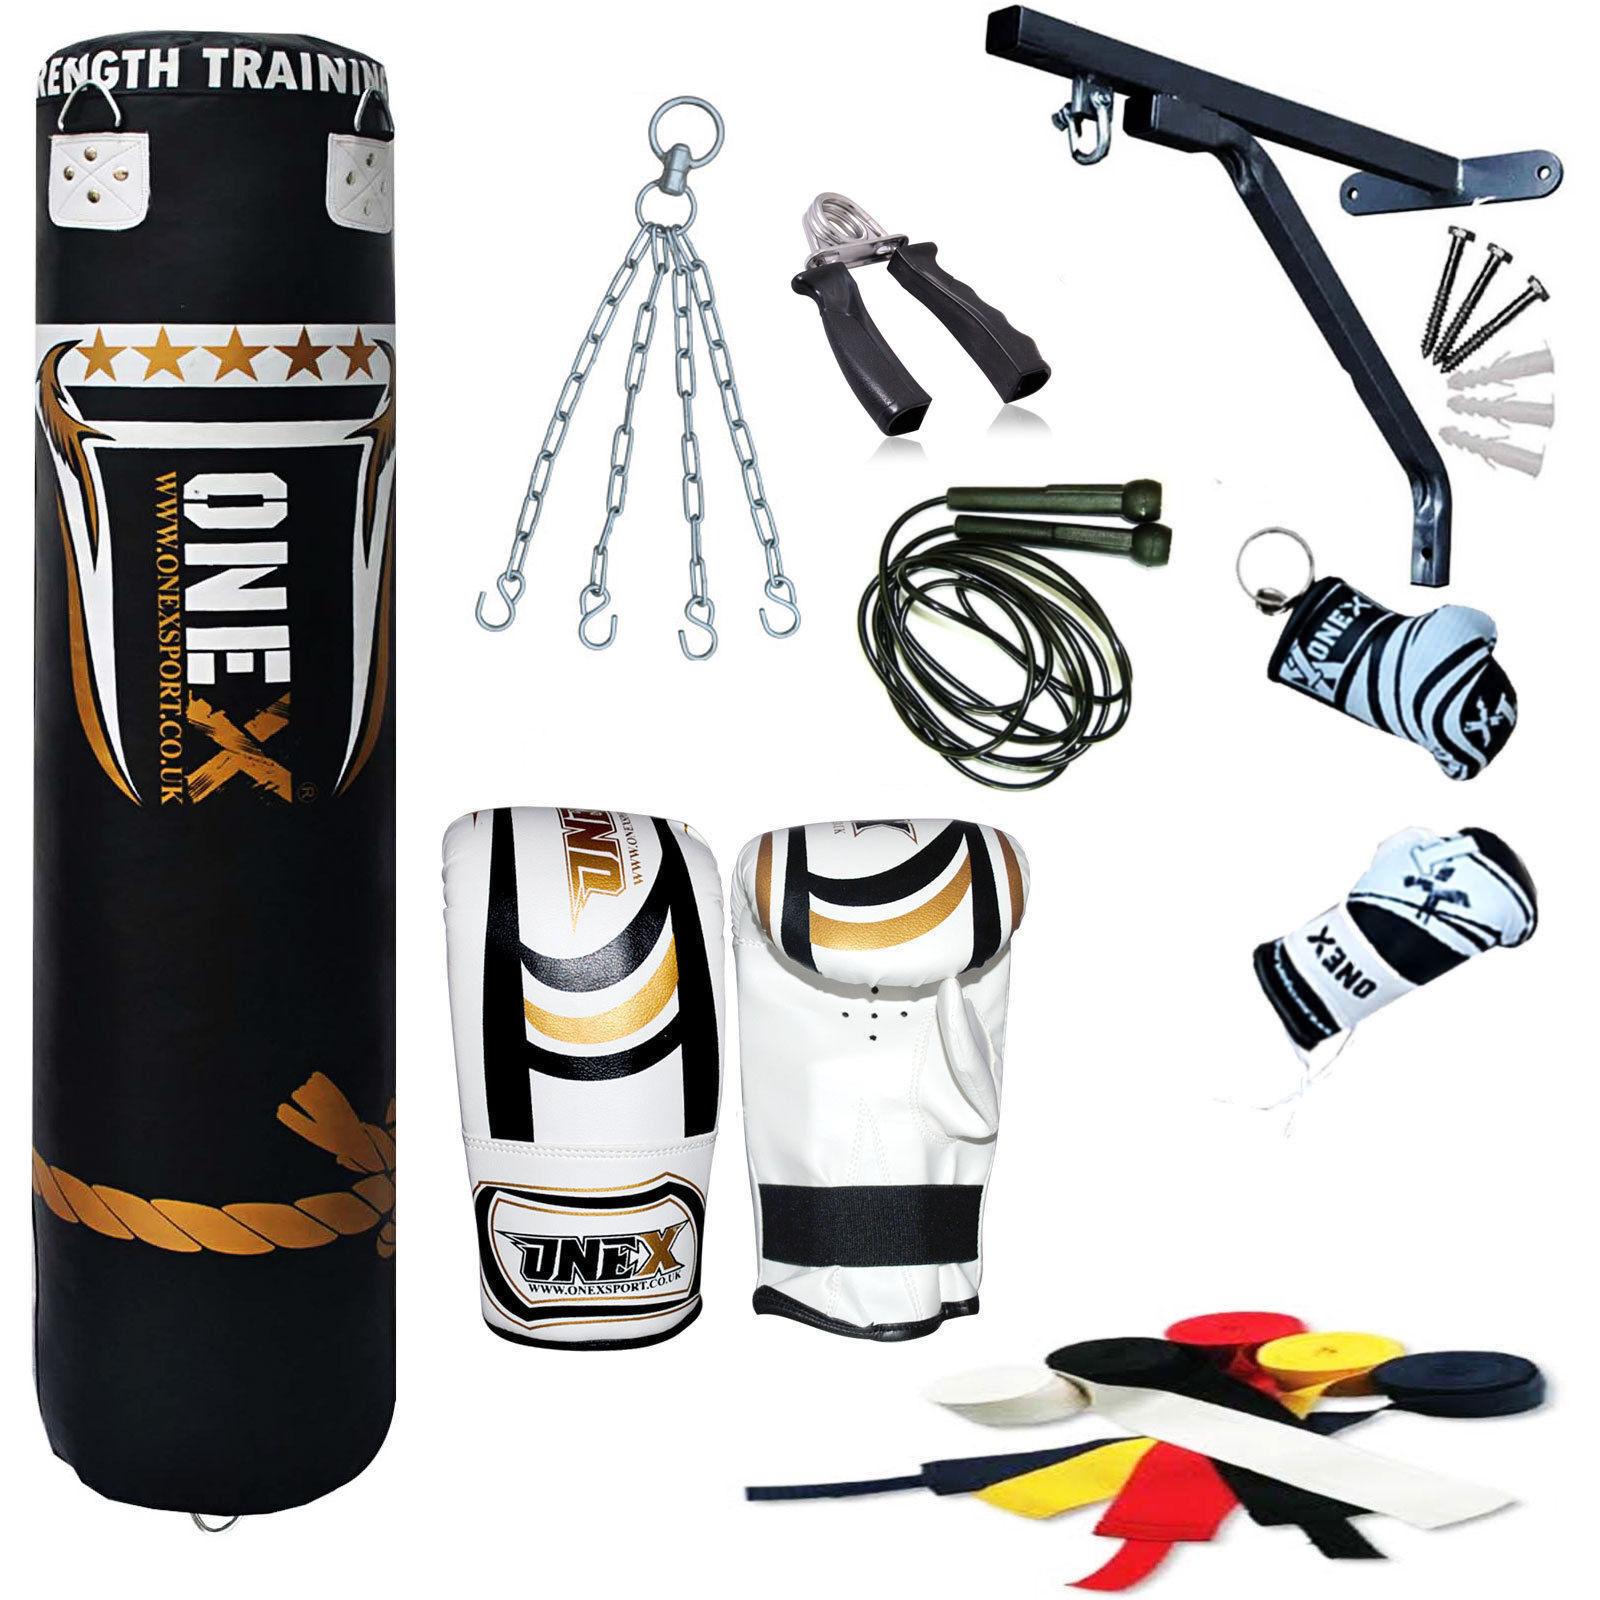 New Junior Punch Bag 13 Piece Piece Piece 5 Ft Heavy Filled Boxing Bag c0e85e